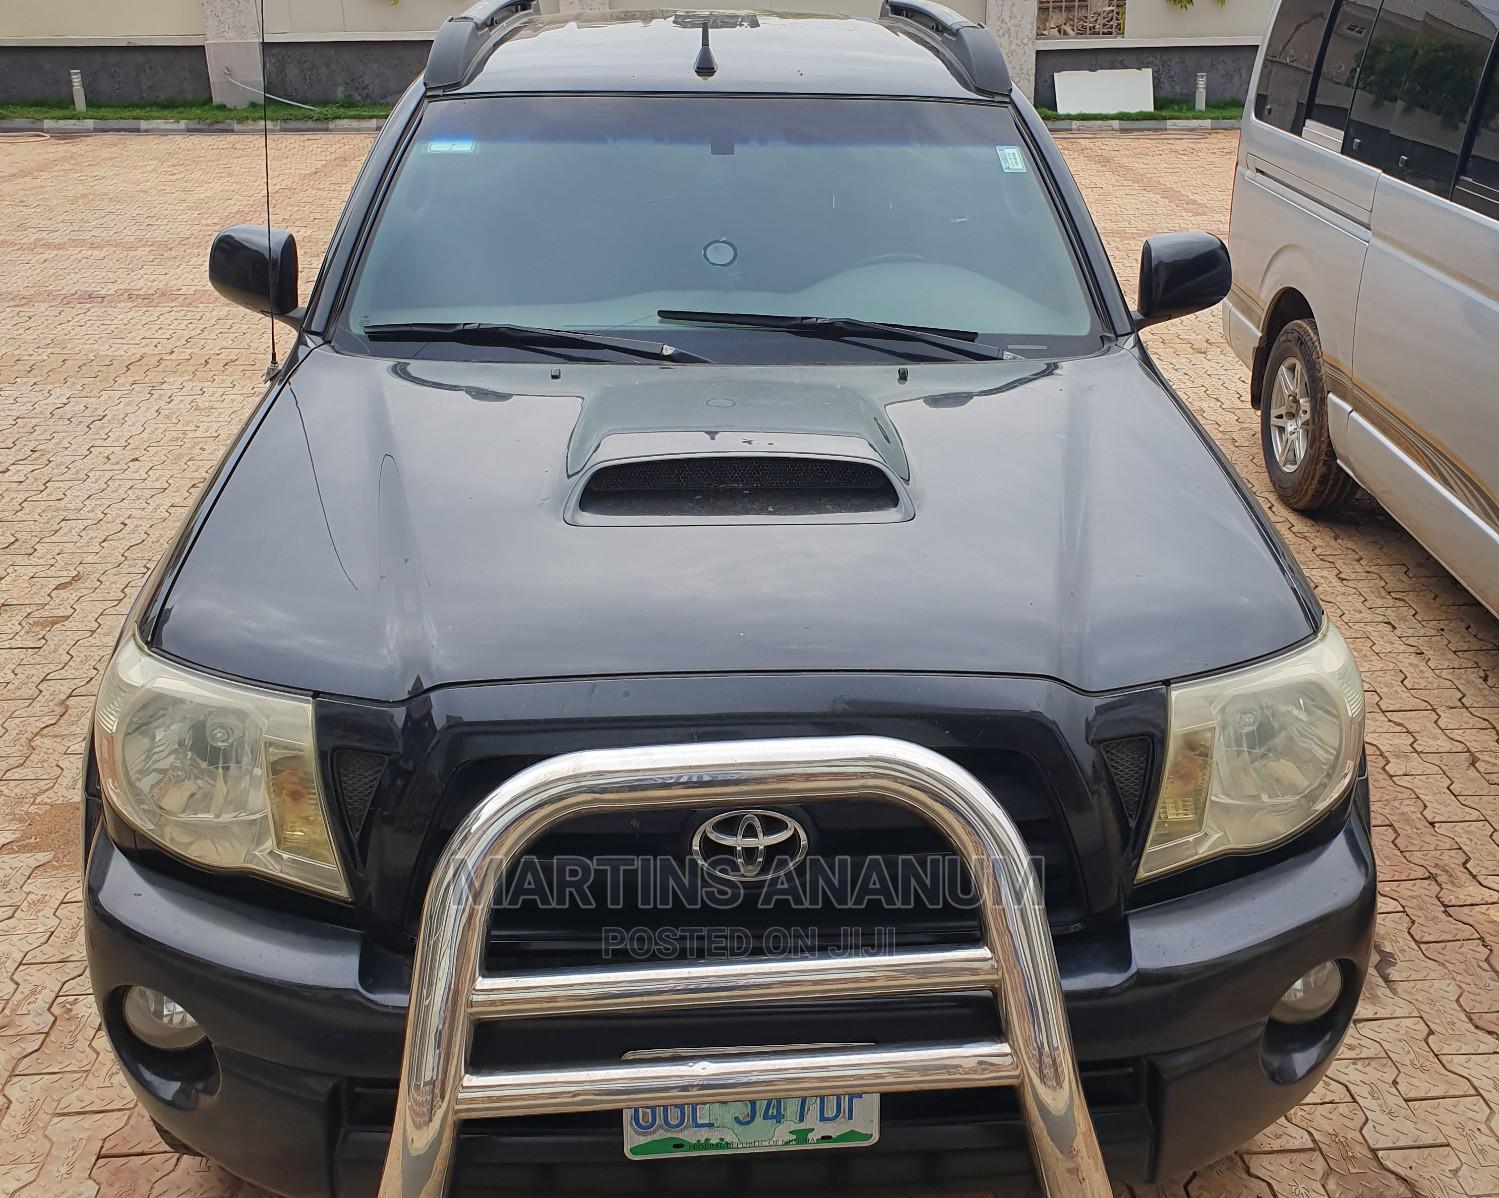 Archive: Toyota Tacoma 2005 Double Cab V6 4WD Black